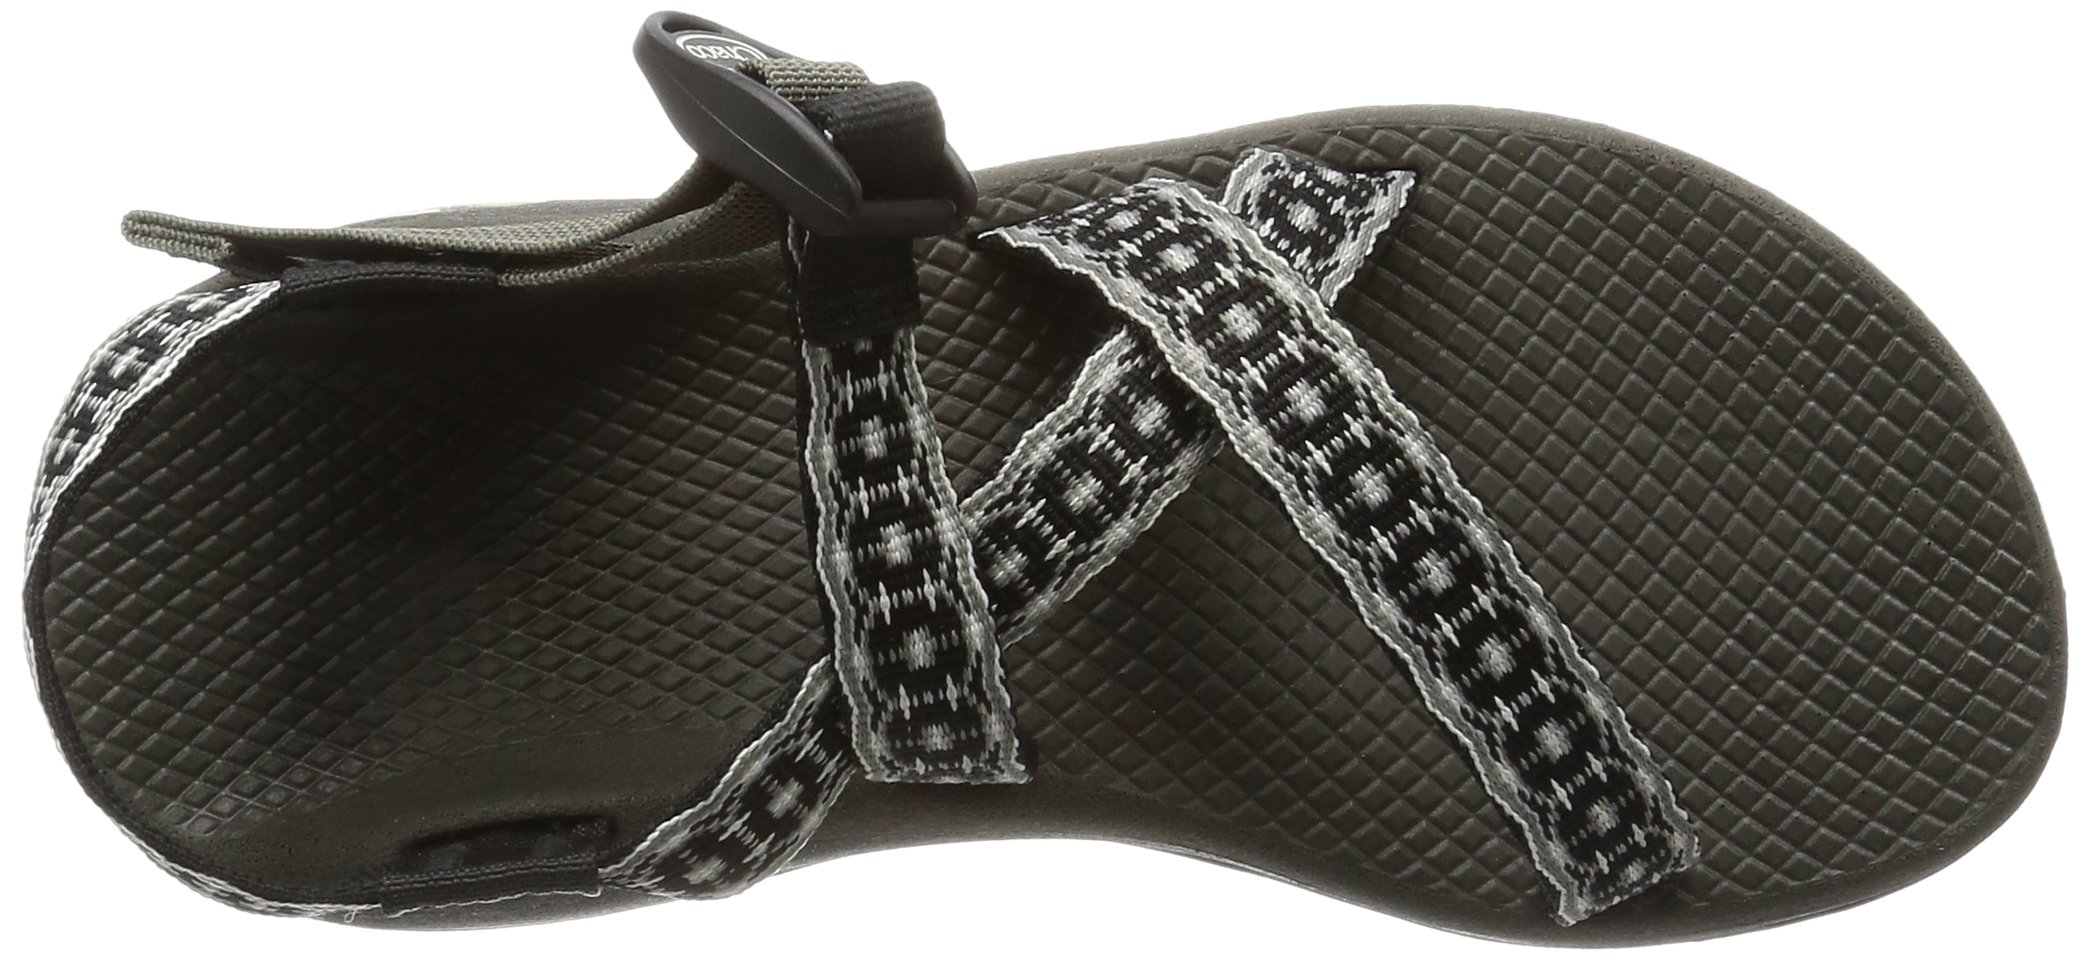 Chaco Women's Zcloud Sport Sandal, Venetian Black, 9 M US by Chaco (Image #8)